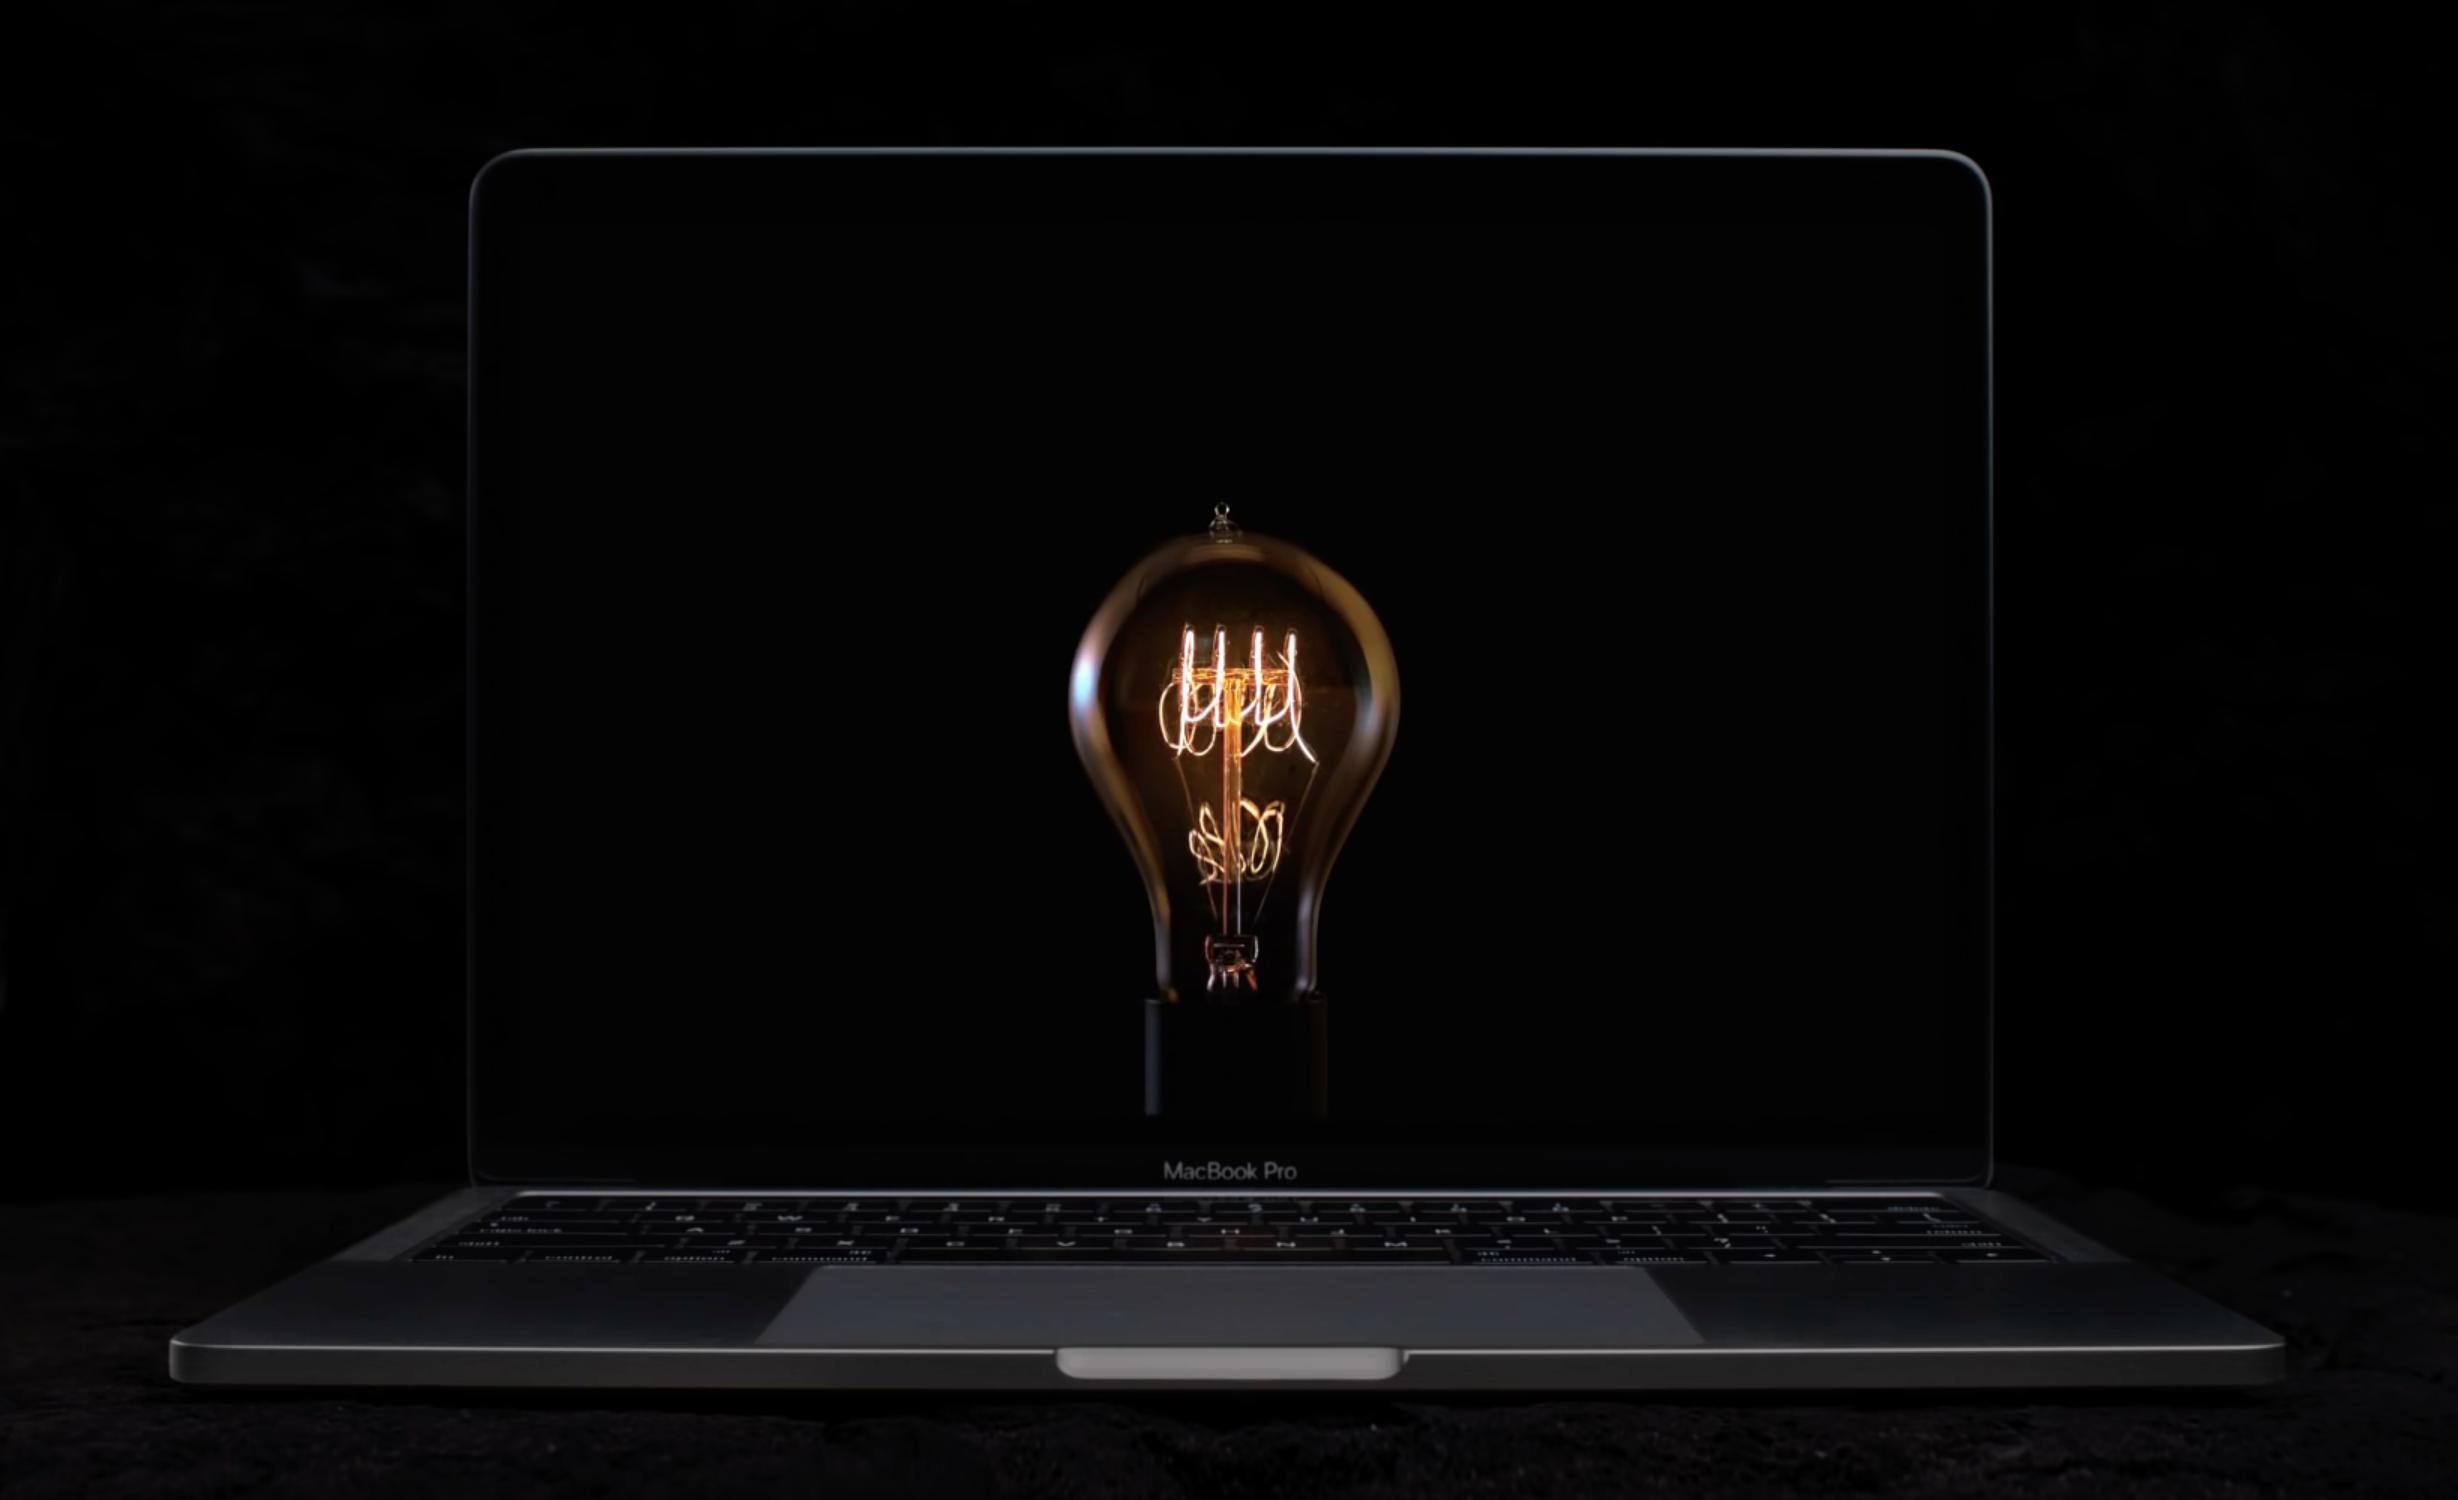 MacBook Pro TV광고 – Bulbs